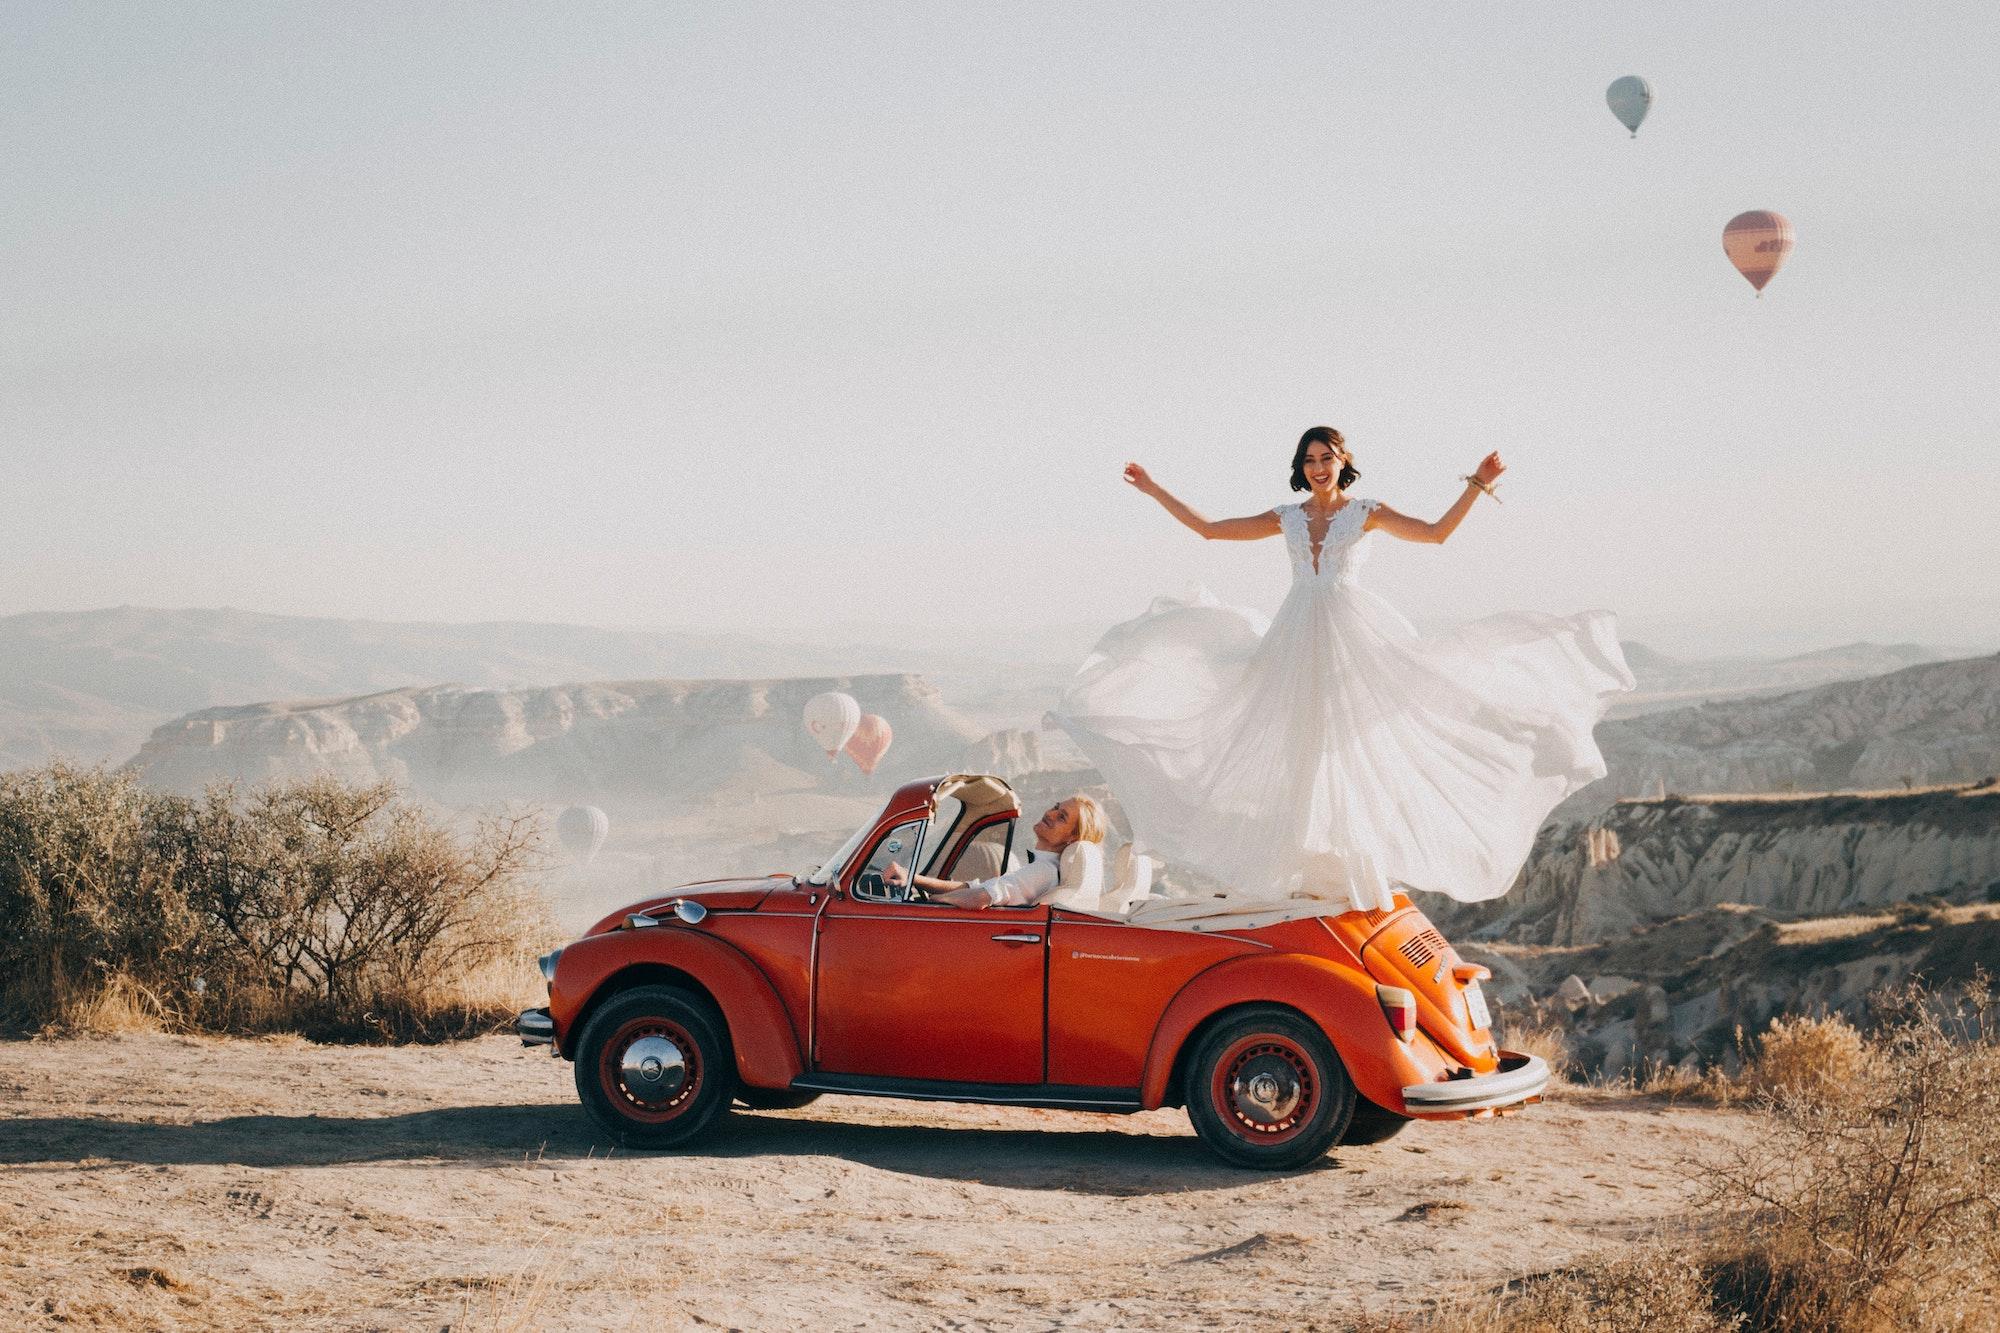 Unique wedding ideas to make your wedding the best day ever | Wedding Tips Blog | Elle Blonde Luxury Lifestyle Destination Blog